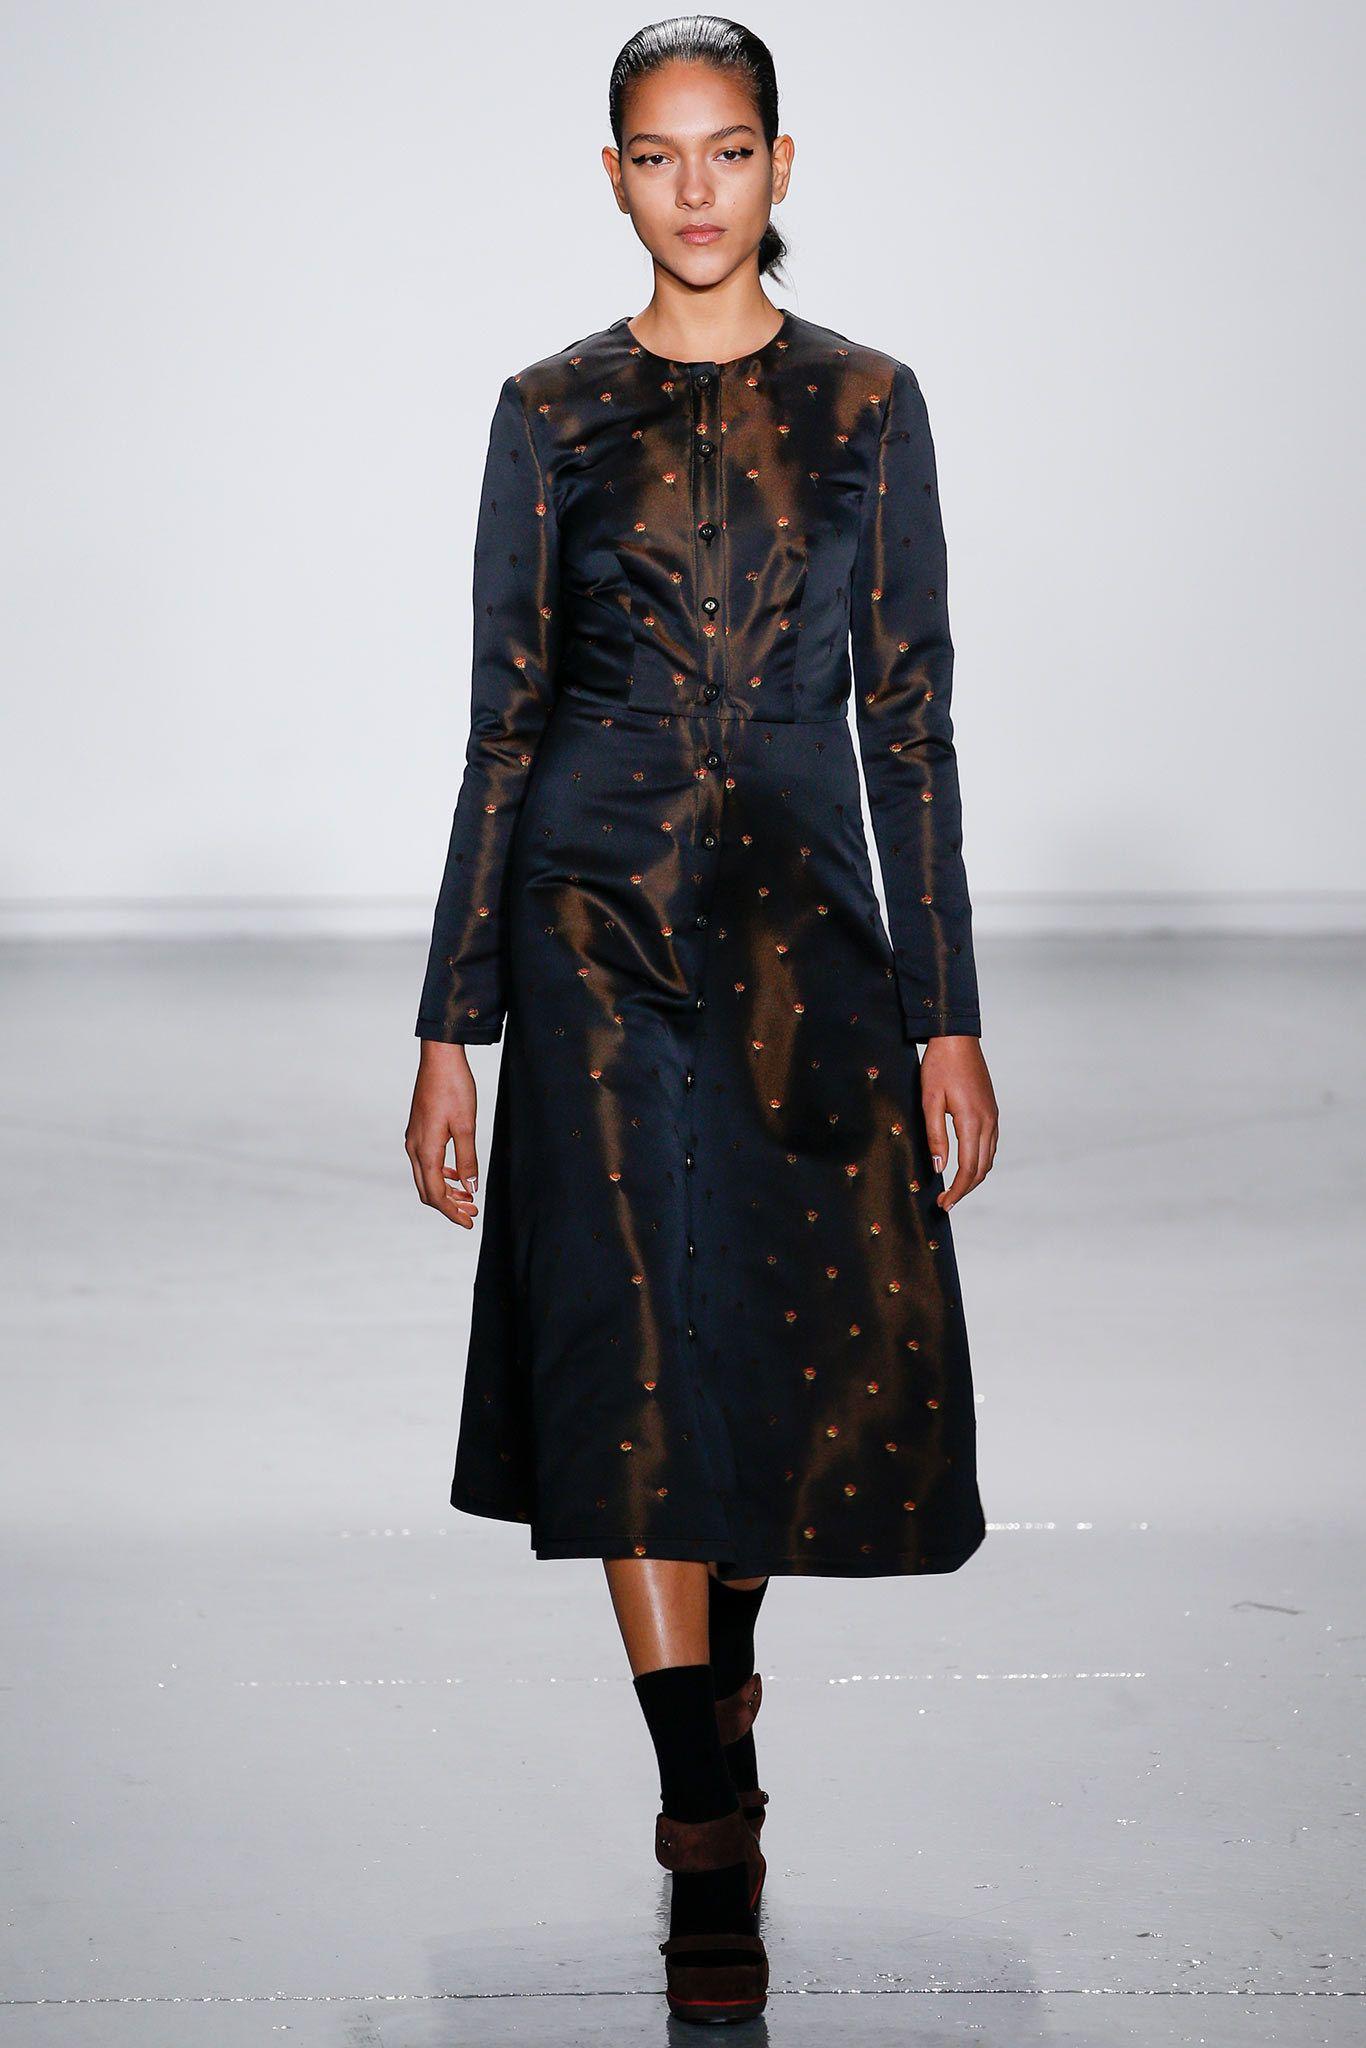 Joline Braun, Suno, Fall 2015 Ready-to-Wear